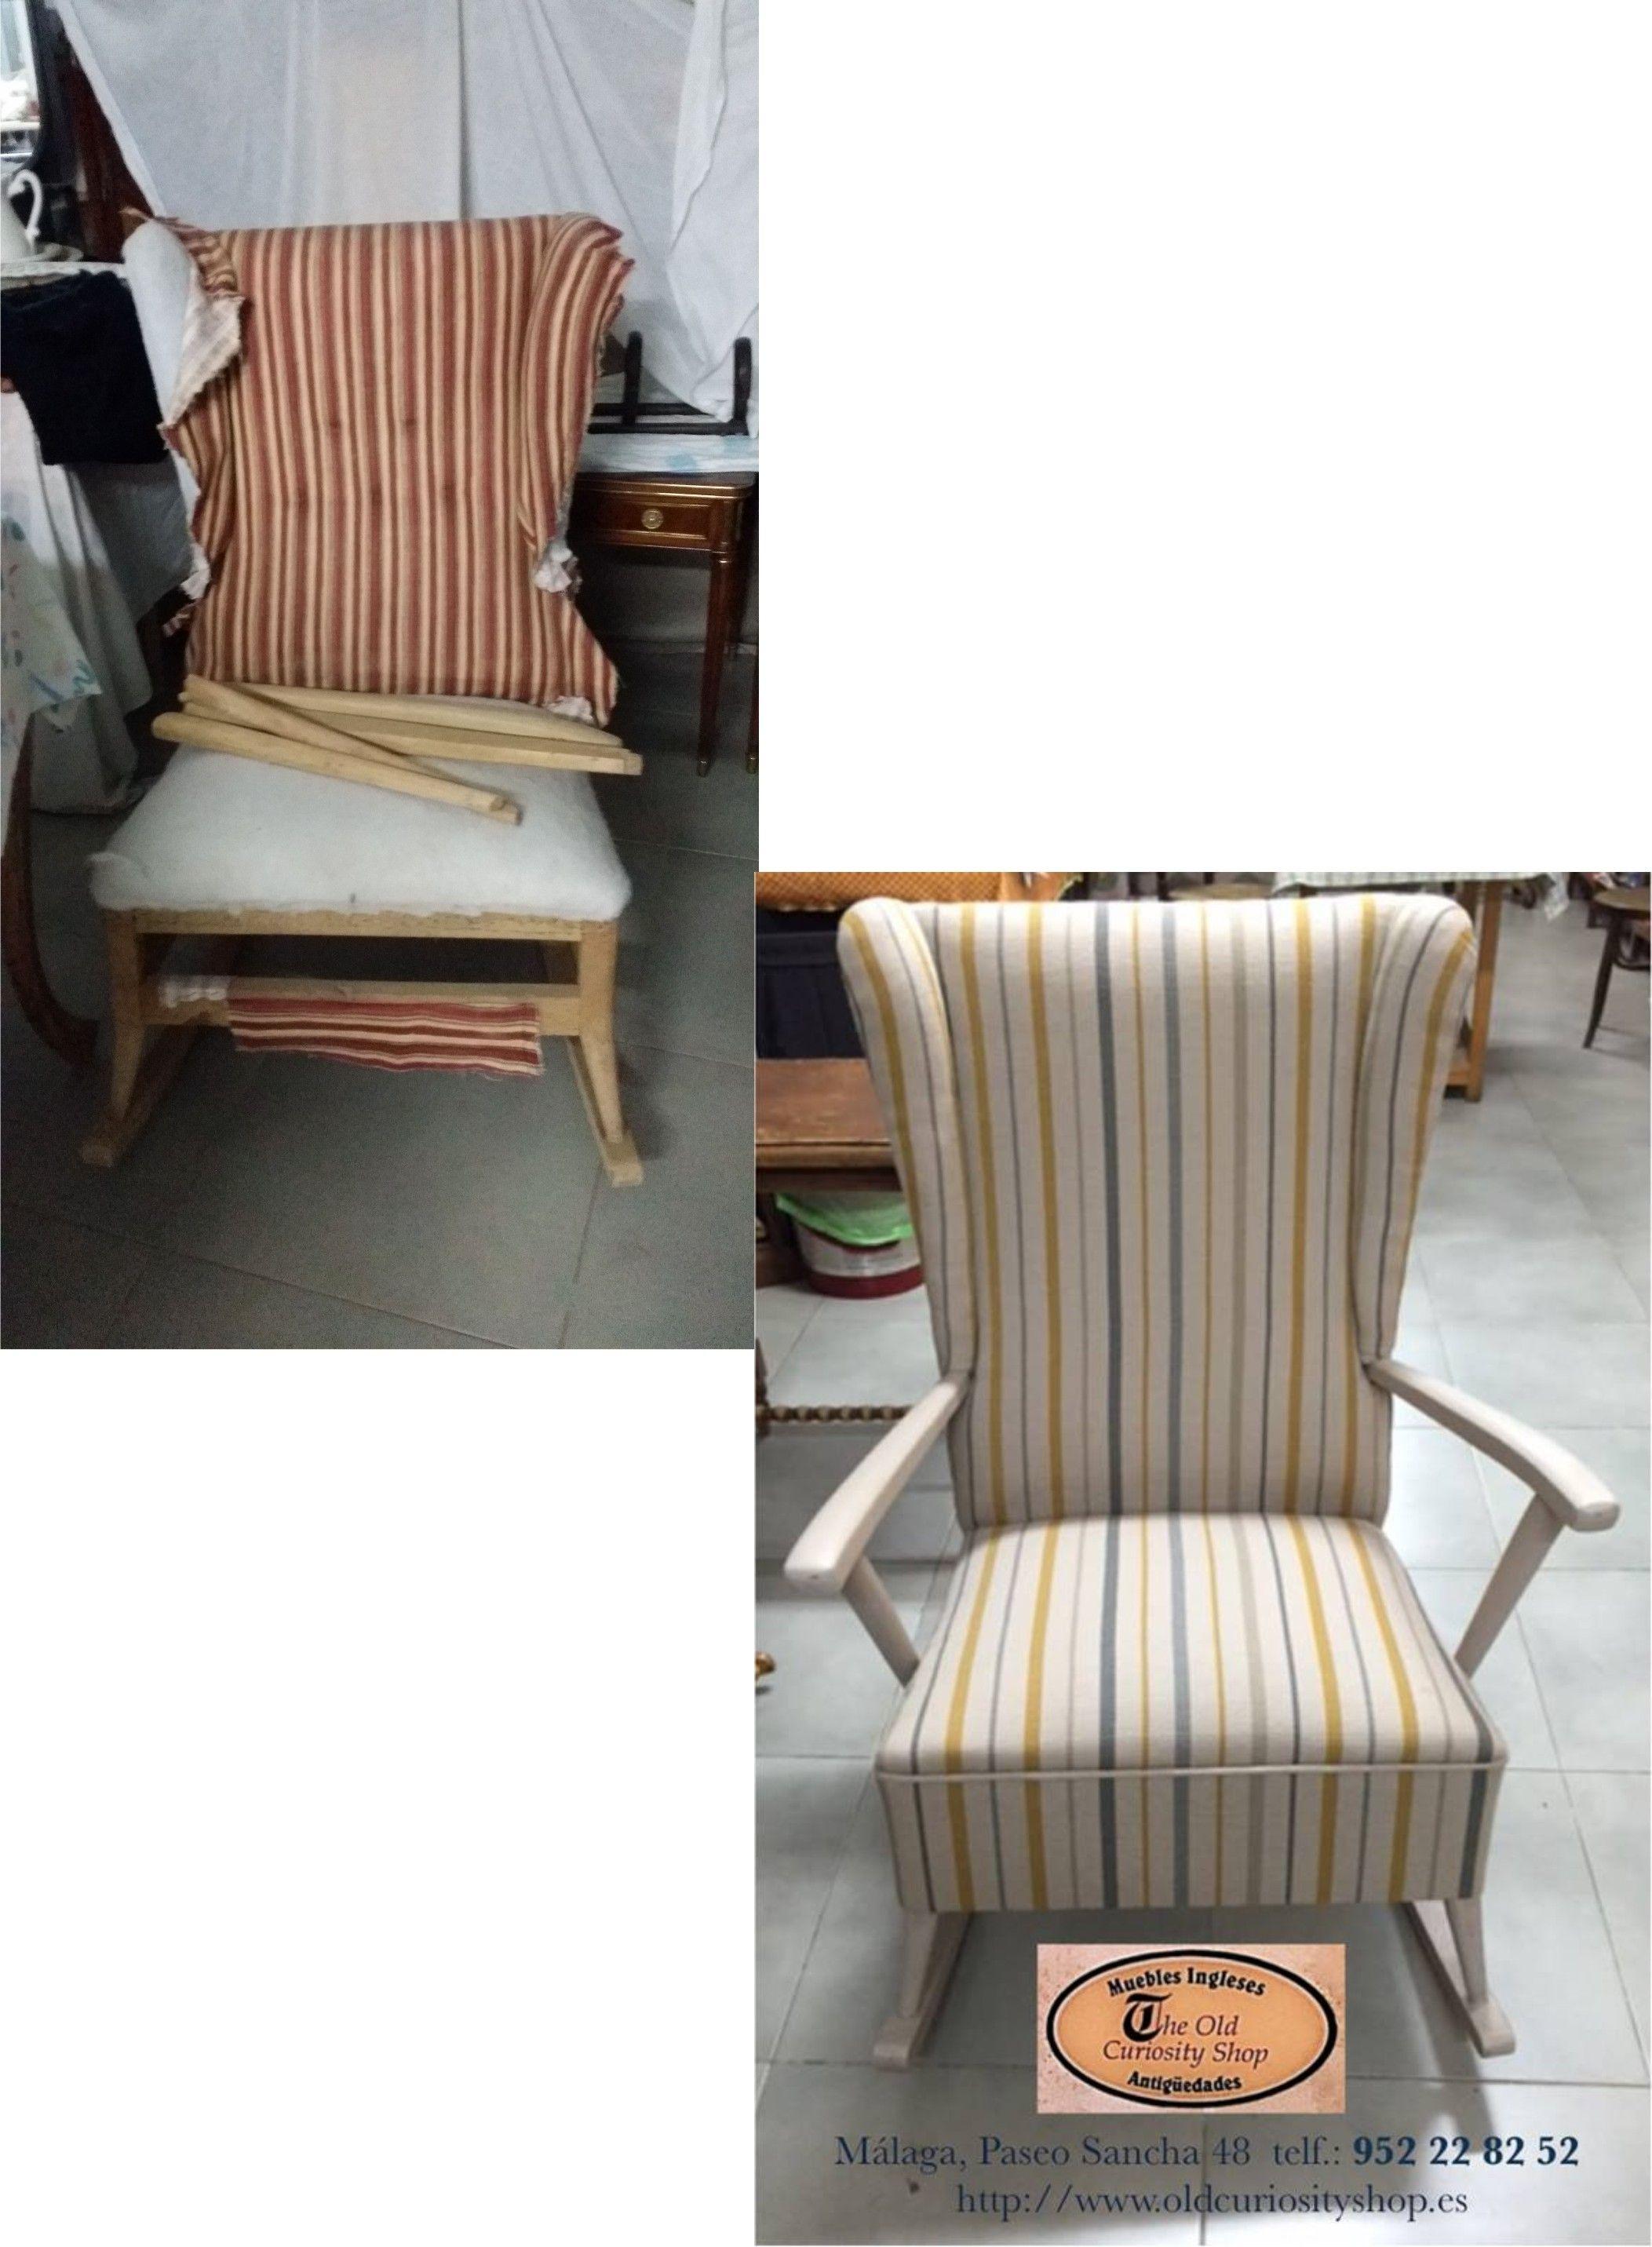 Mecedora vintage pintada y tapizada m laga for Muebles vintage malaga